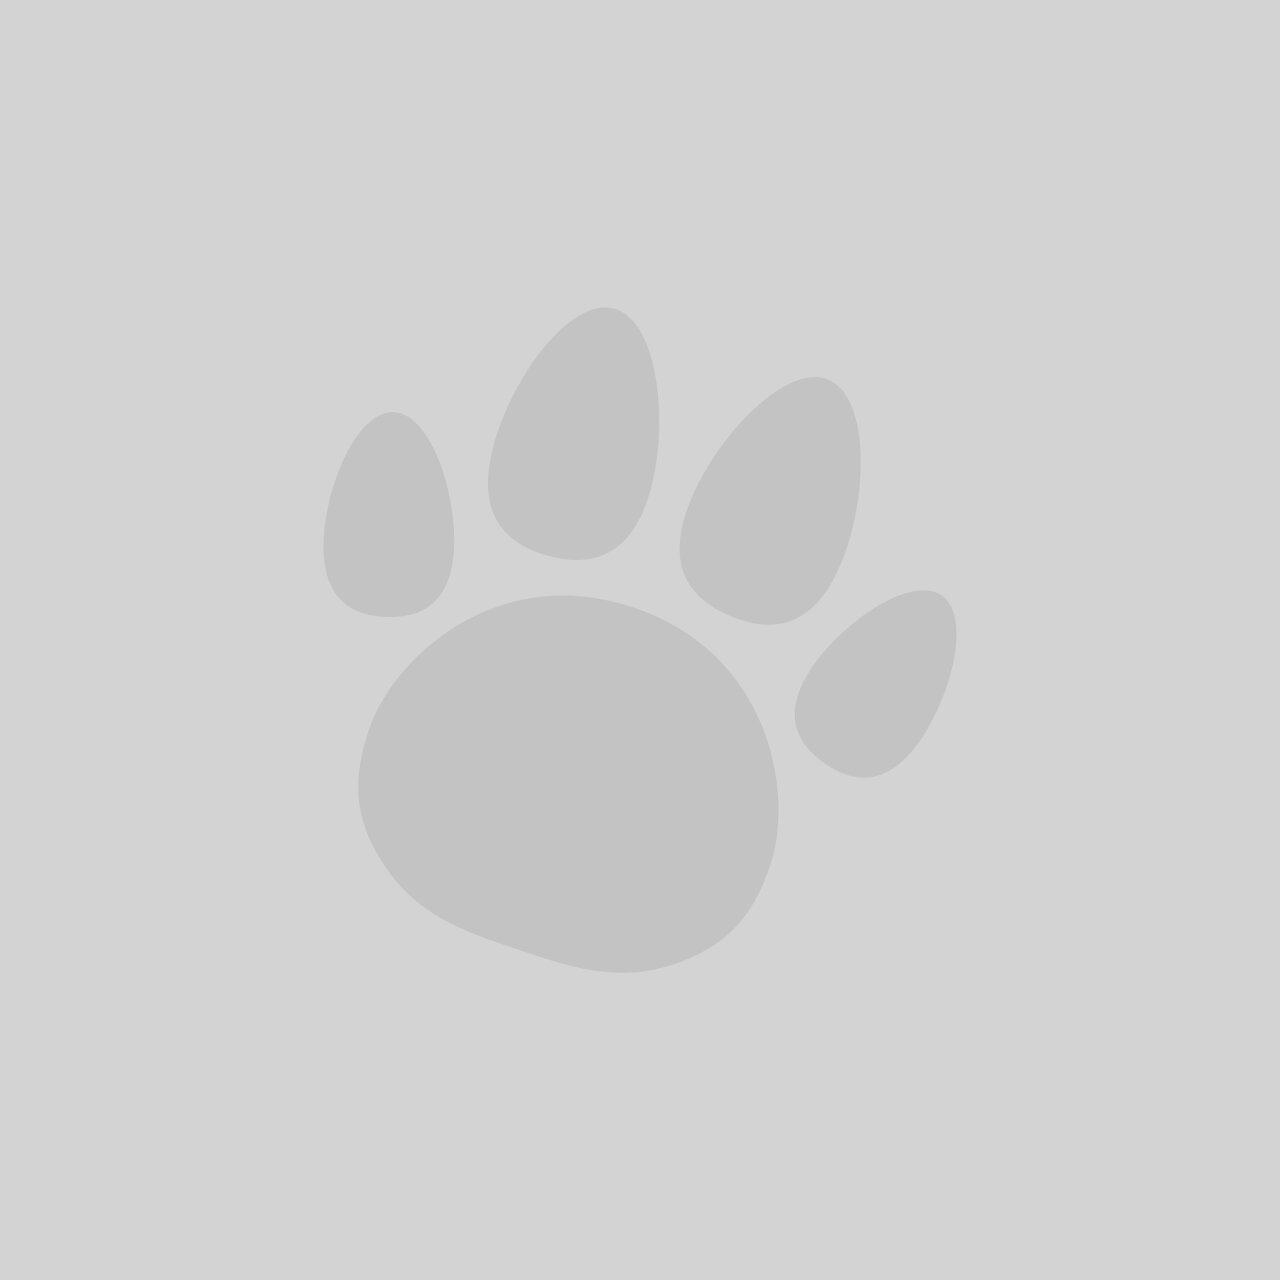 Iams Dog Food Puppy Small/Medium Chicken 2kg